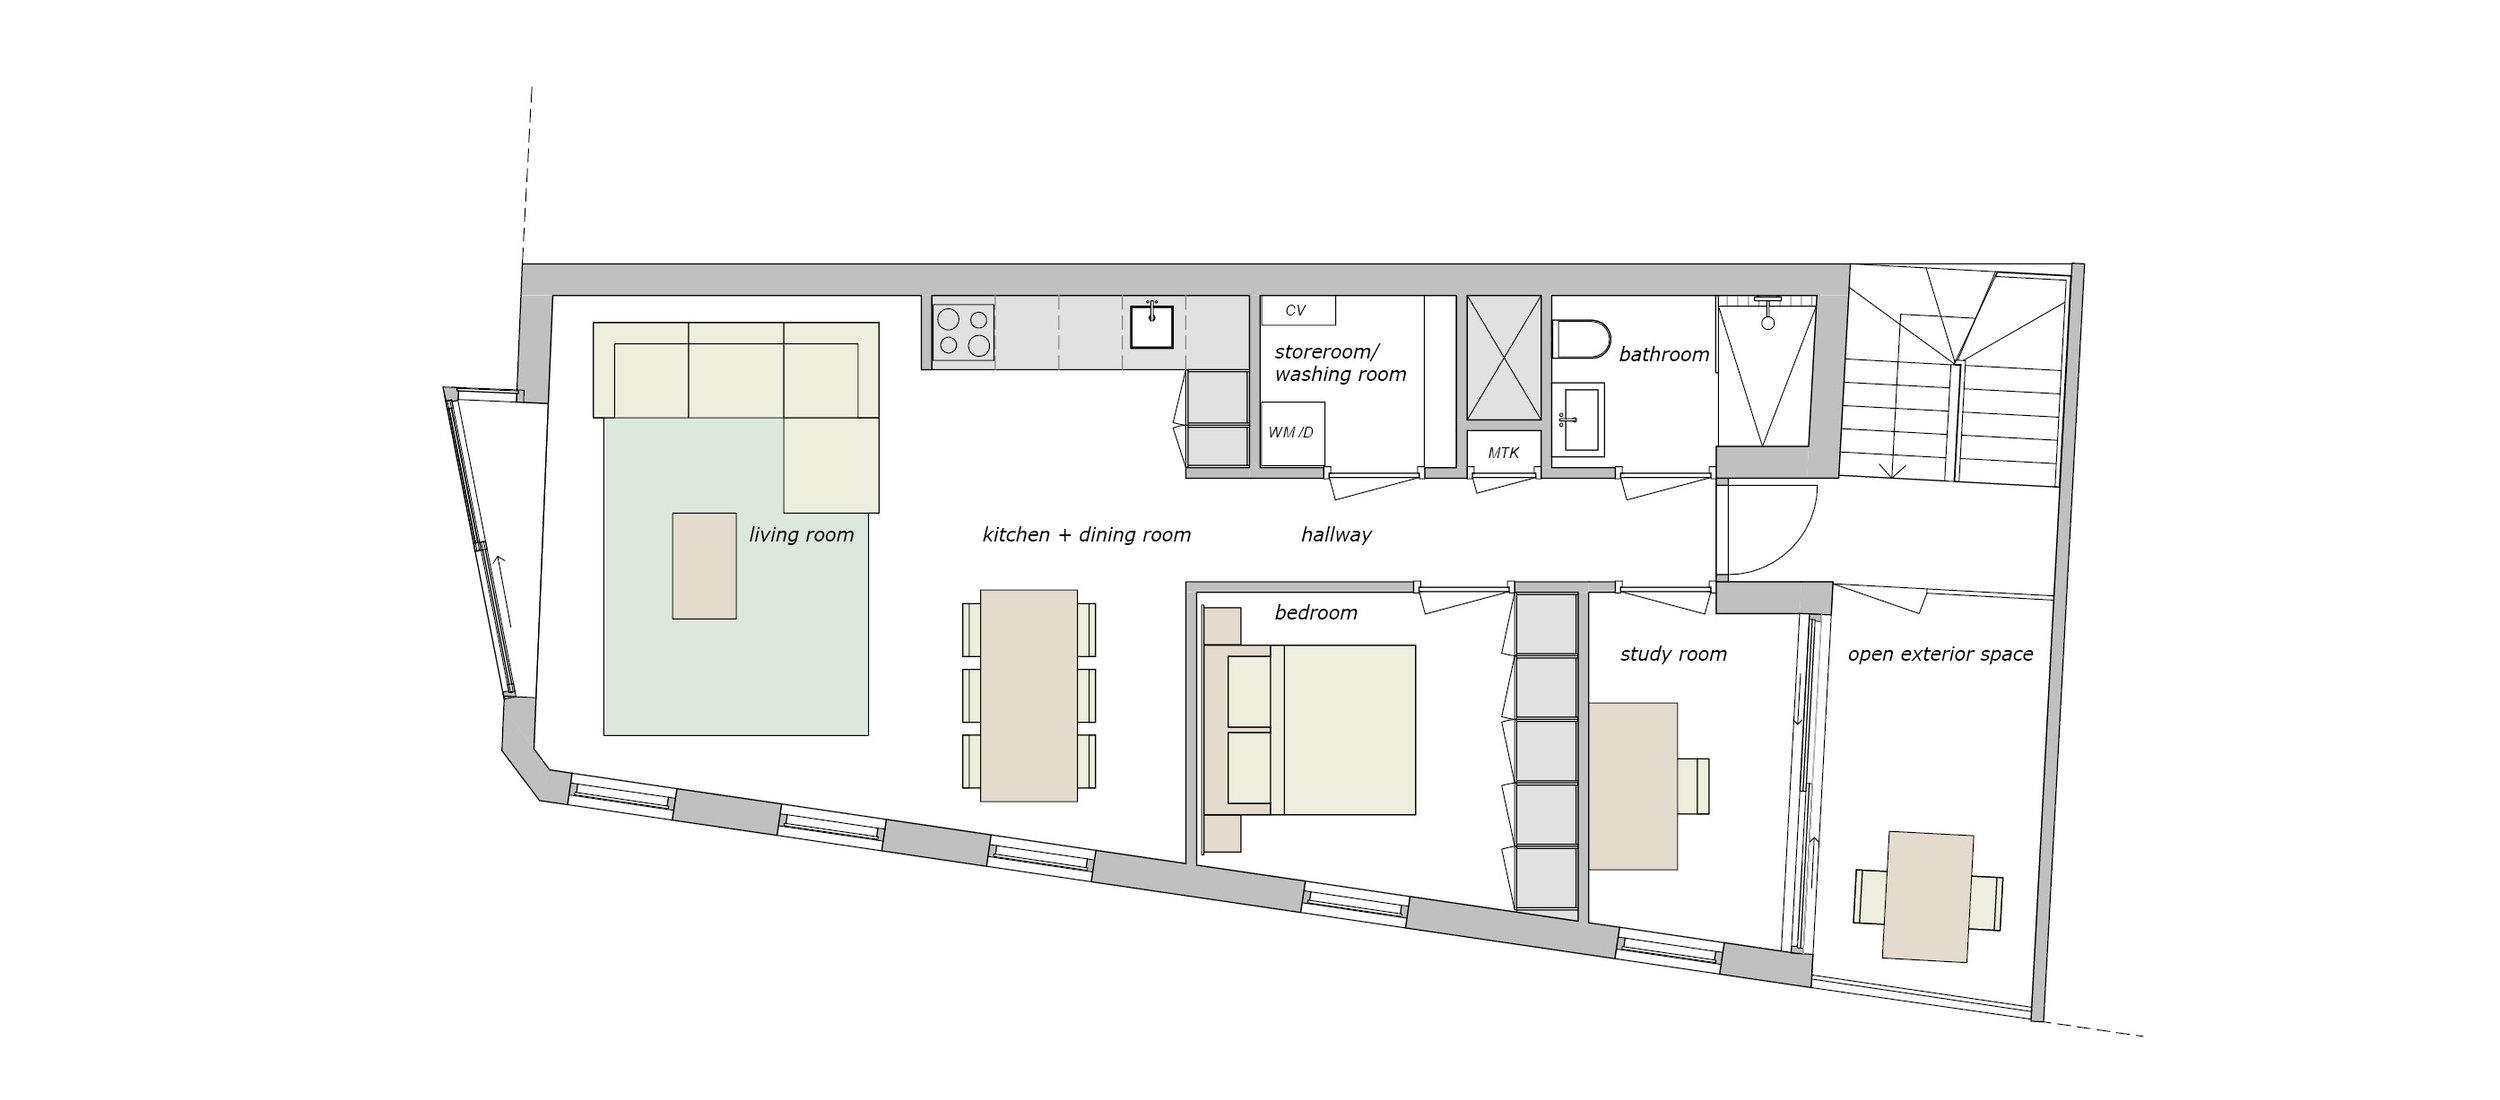 first, second and third floorplan